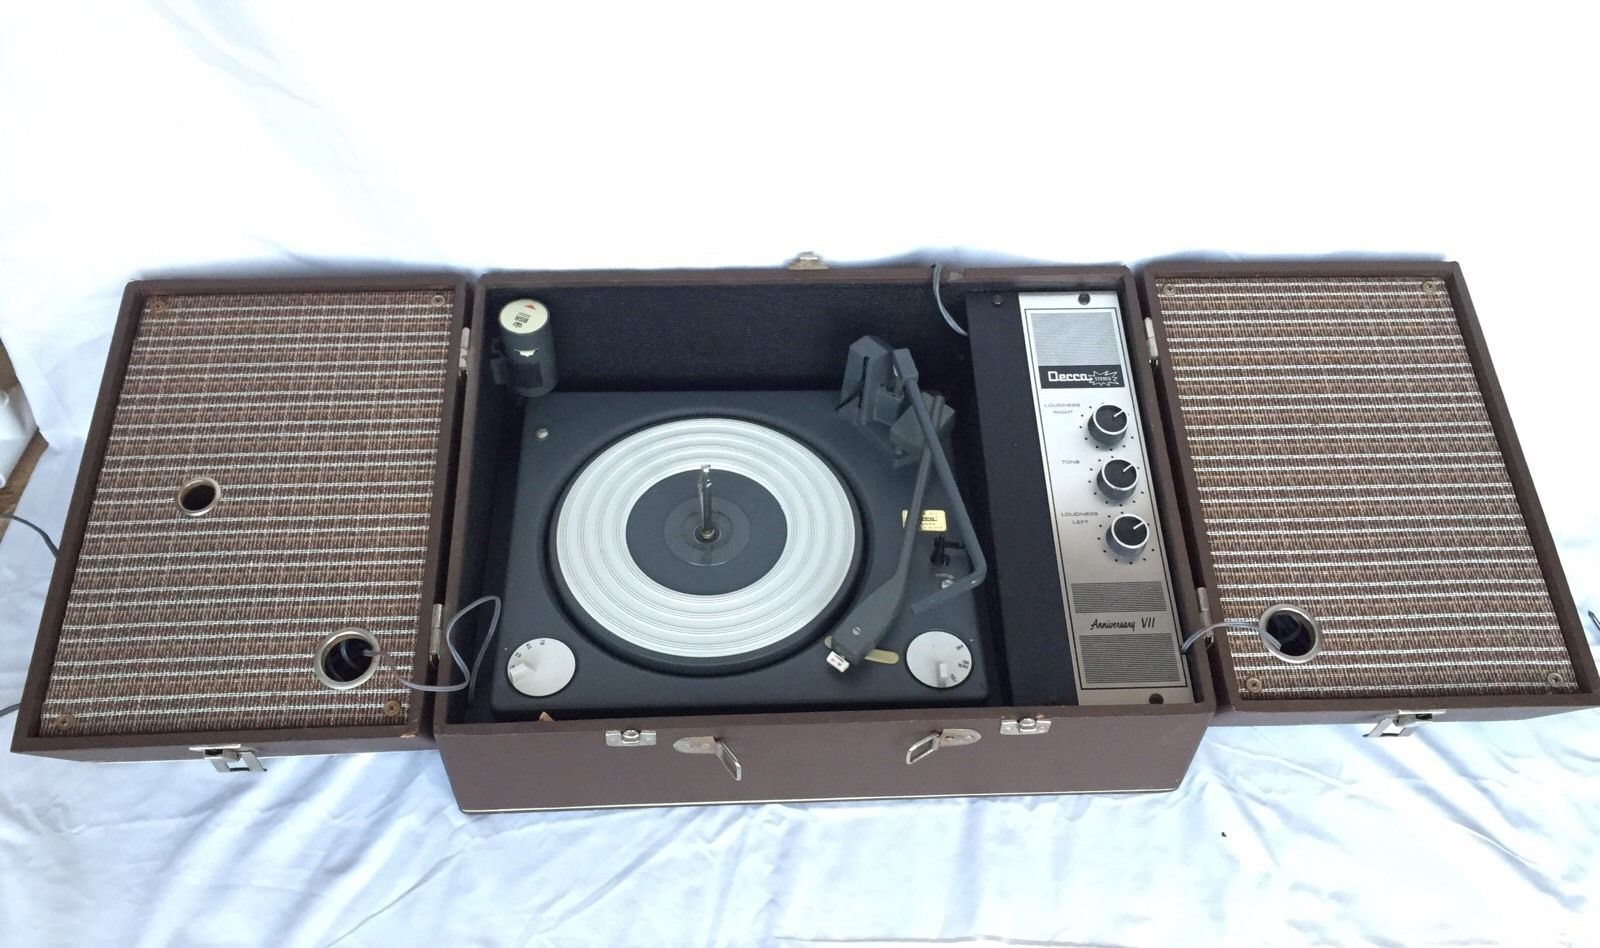 My father's Decca record player. Graphic card, Record